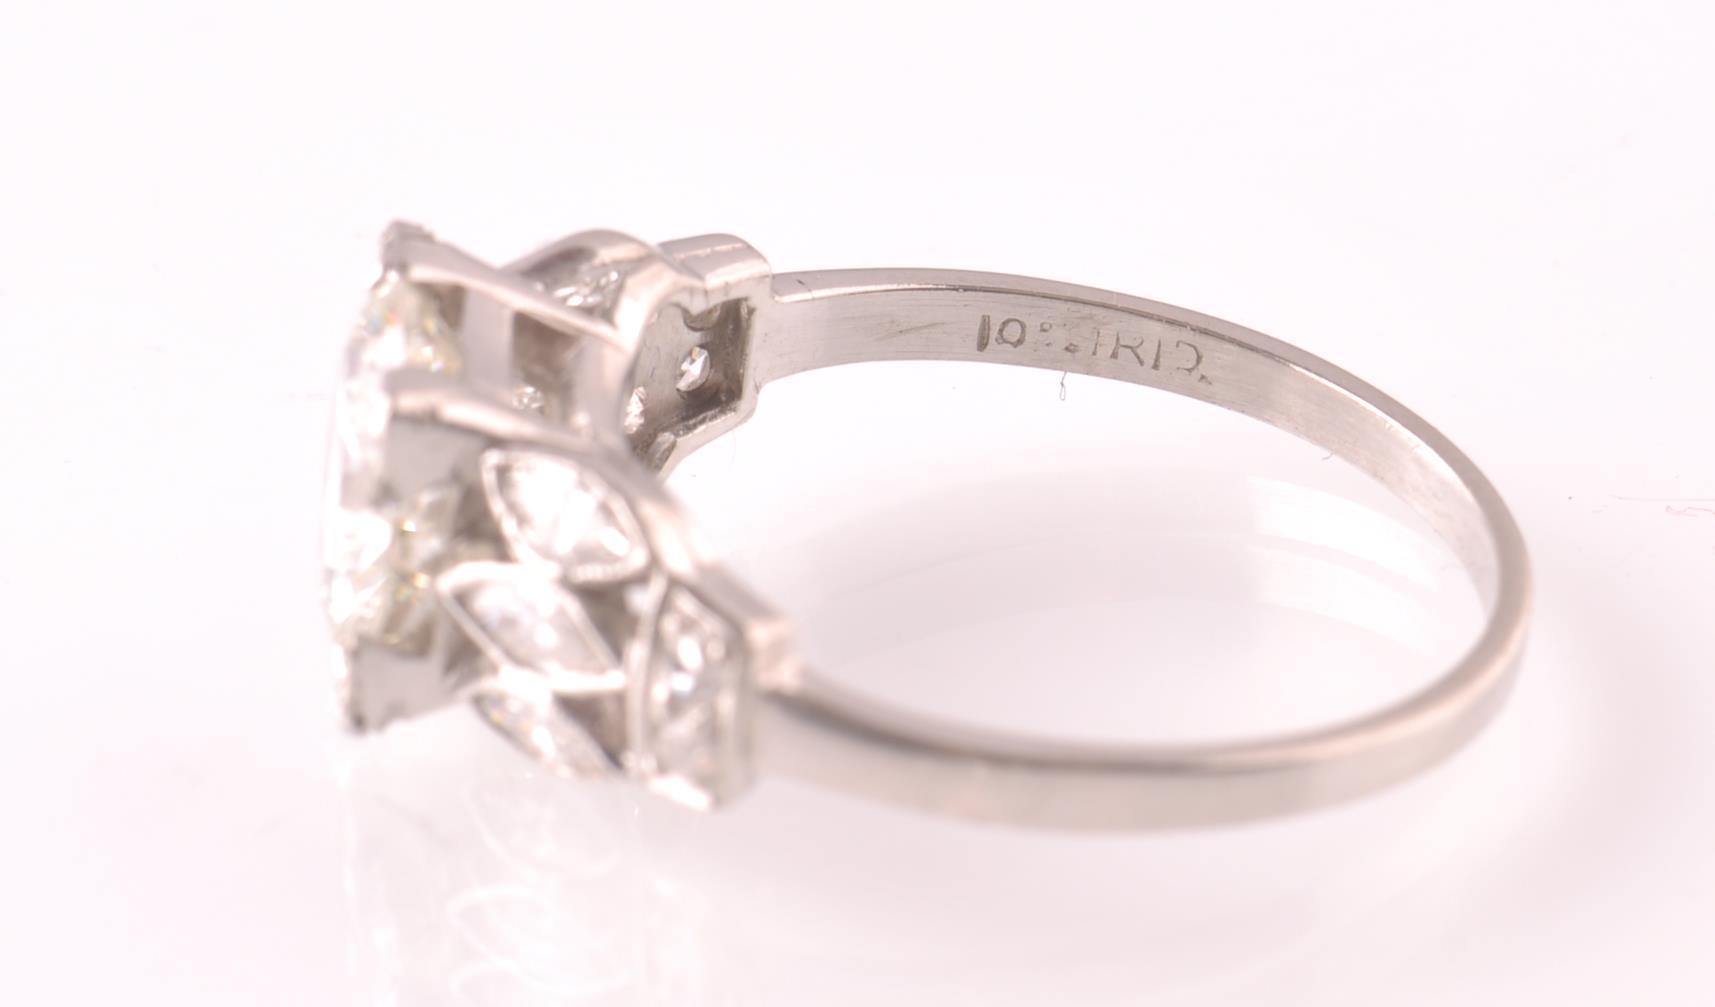 ART DECO PLATINUM AND DIAMOND SOLITAIRE 2CT RING - Image 4 of 5